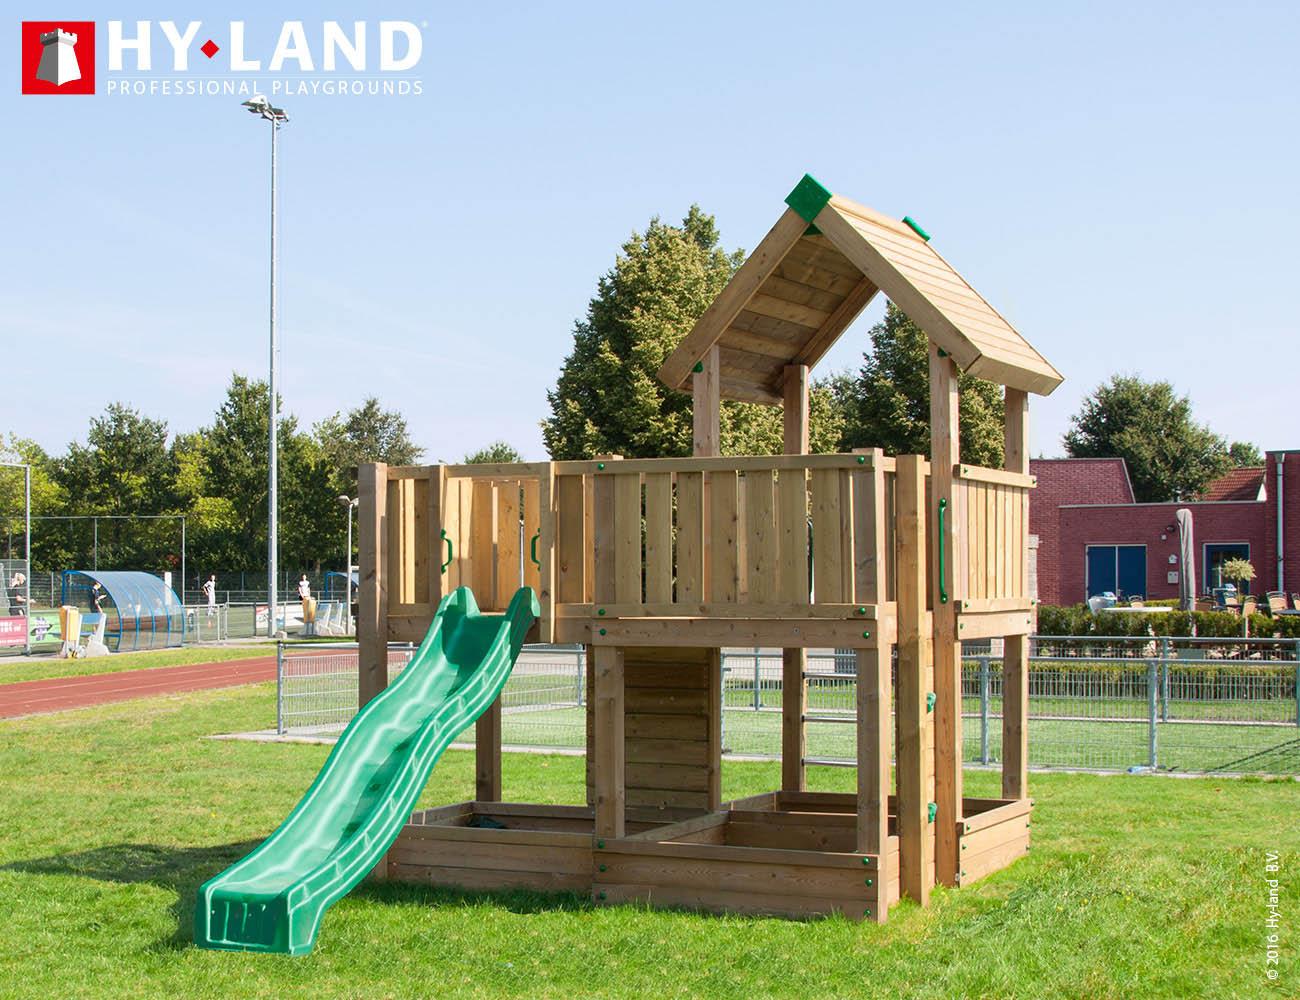 Hy-Land Projekt 5 – Bild 3